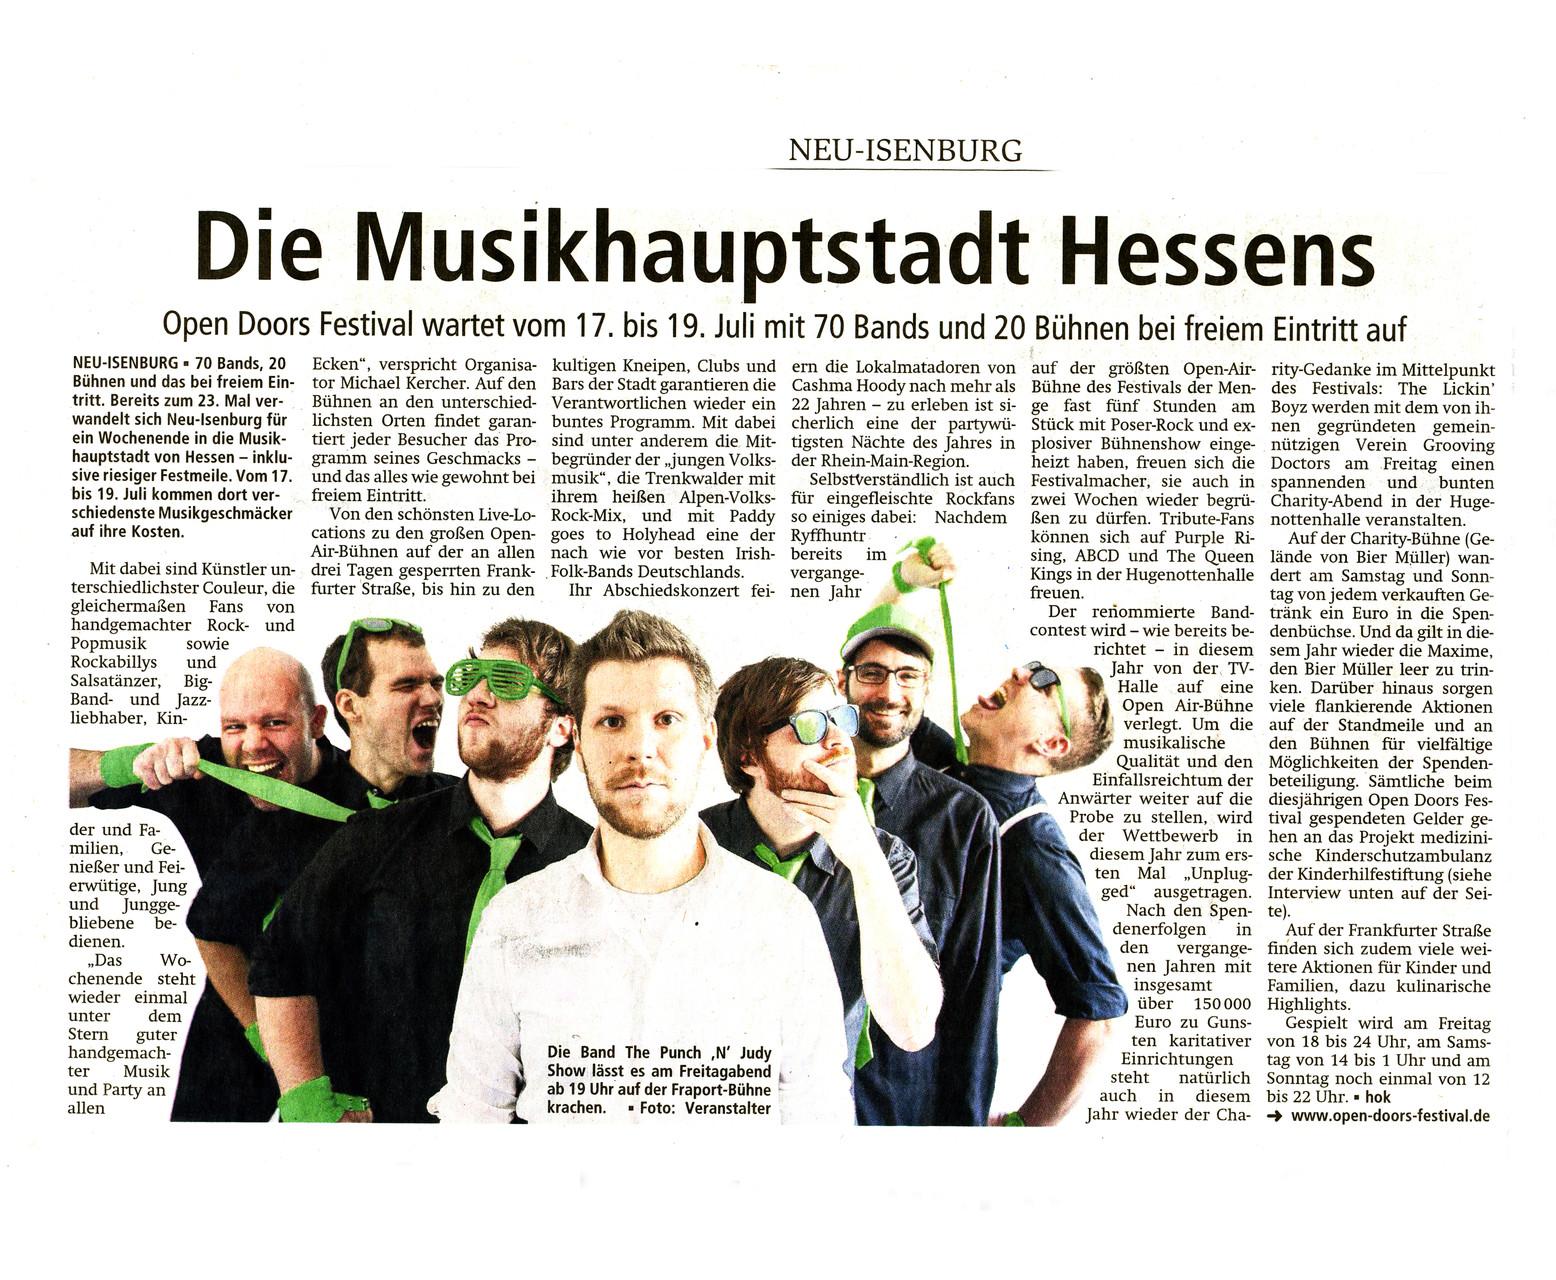 Offenbach Post, 3. Juli 2015